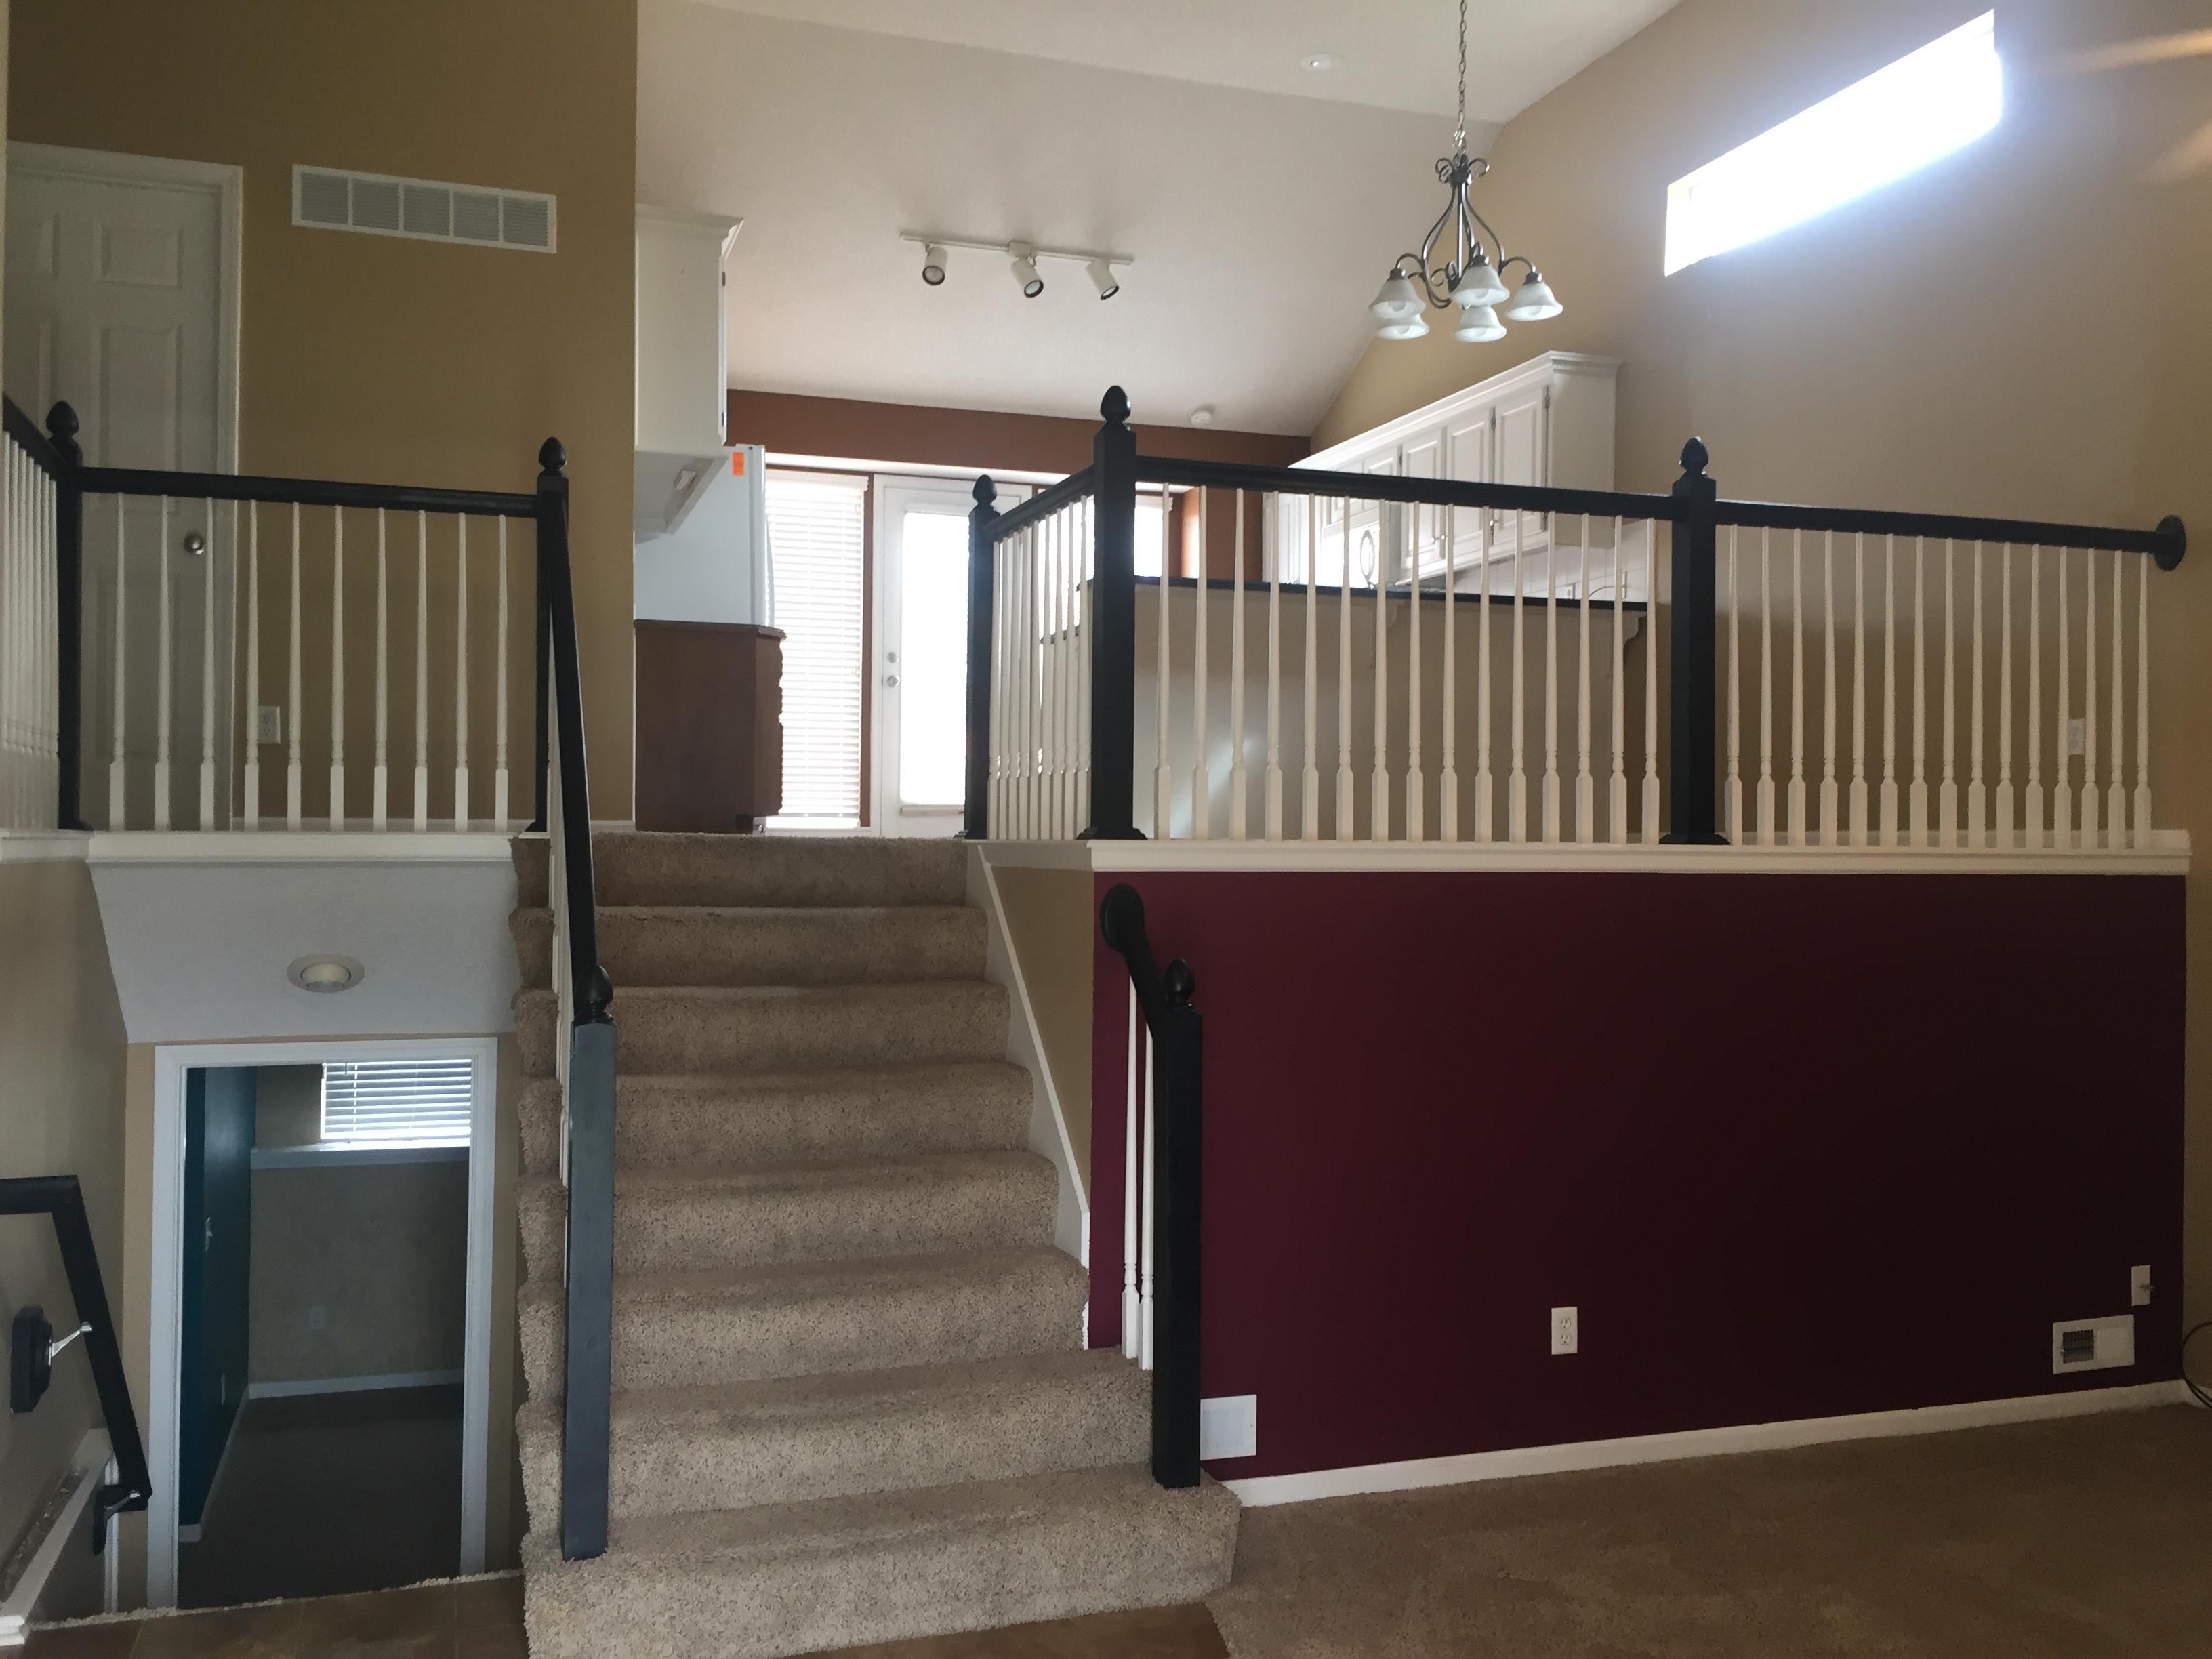 Photo of 21230 W 120th Terrace, Olathe, KS, 66061